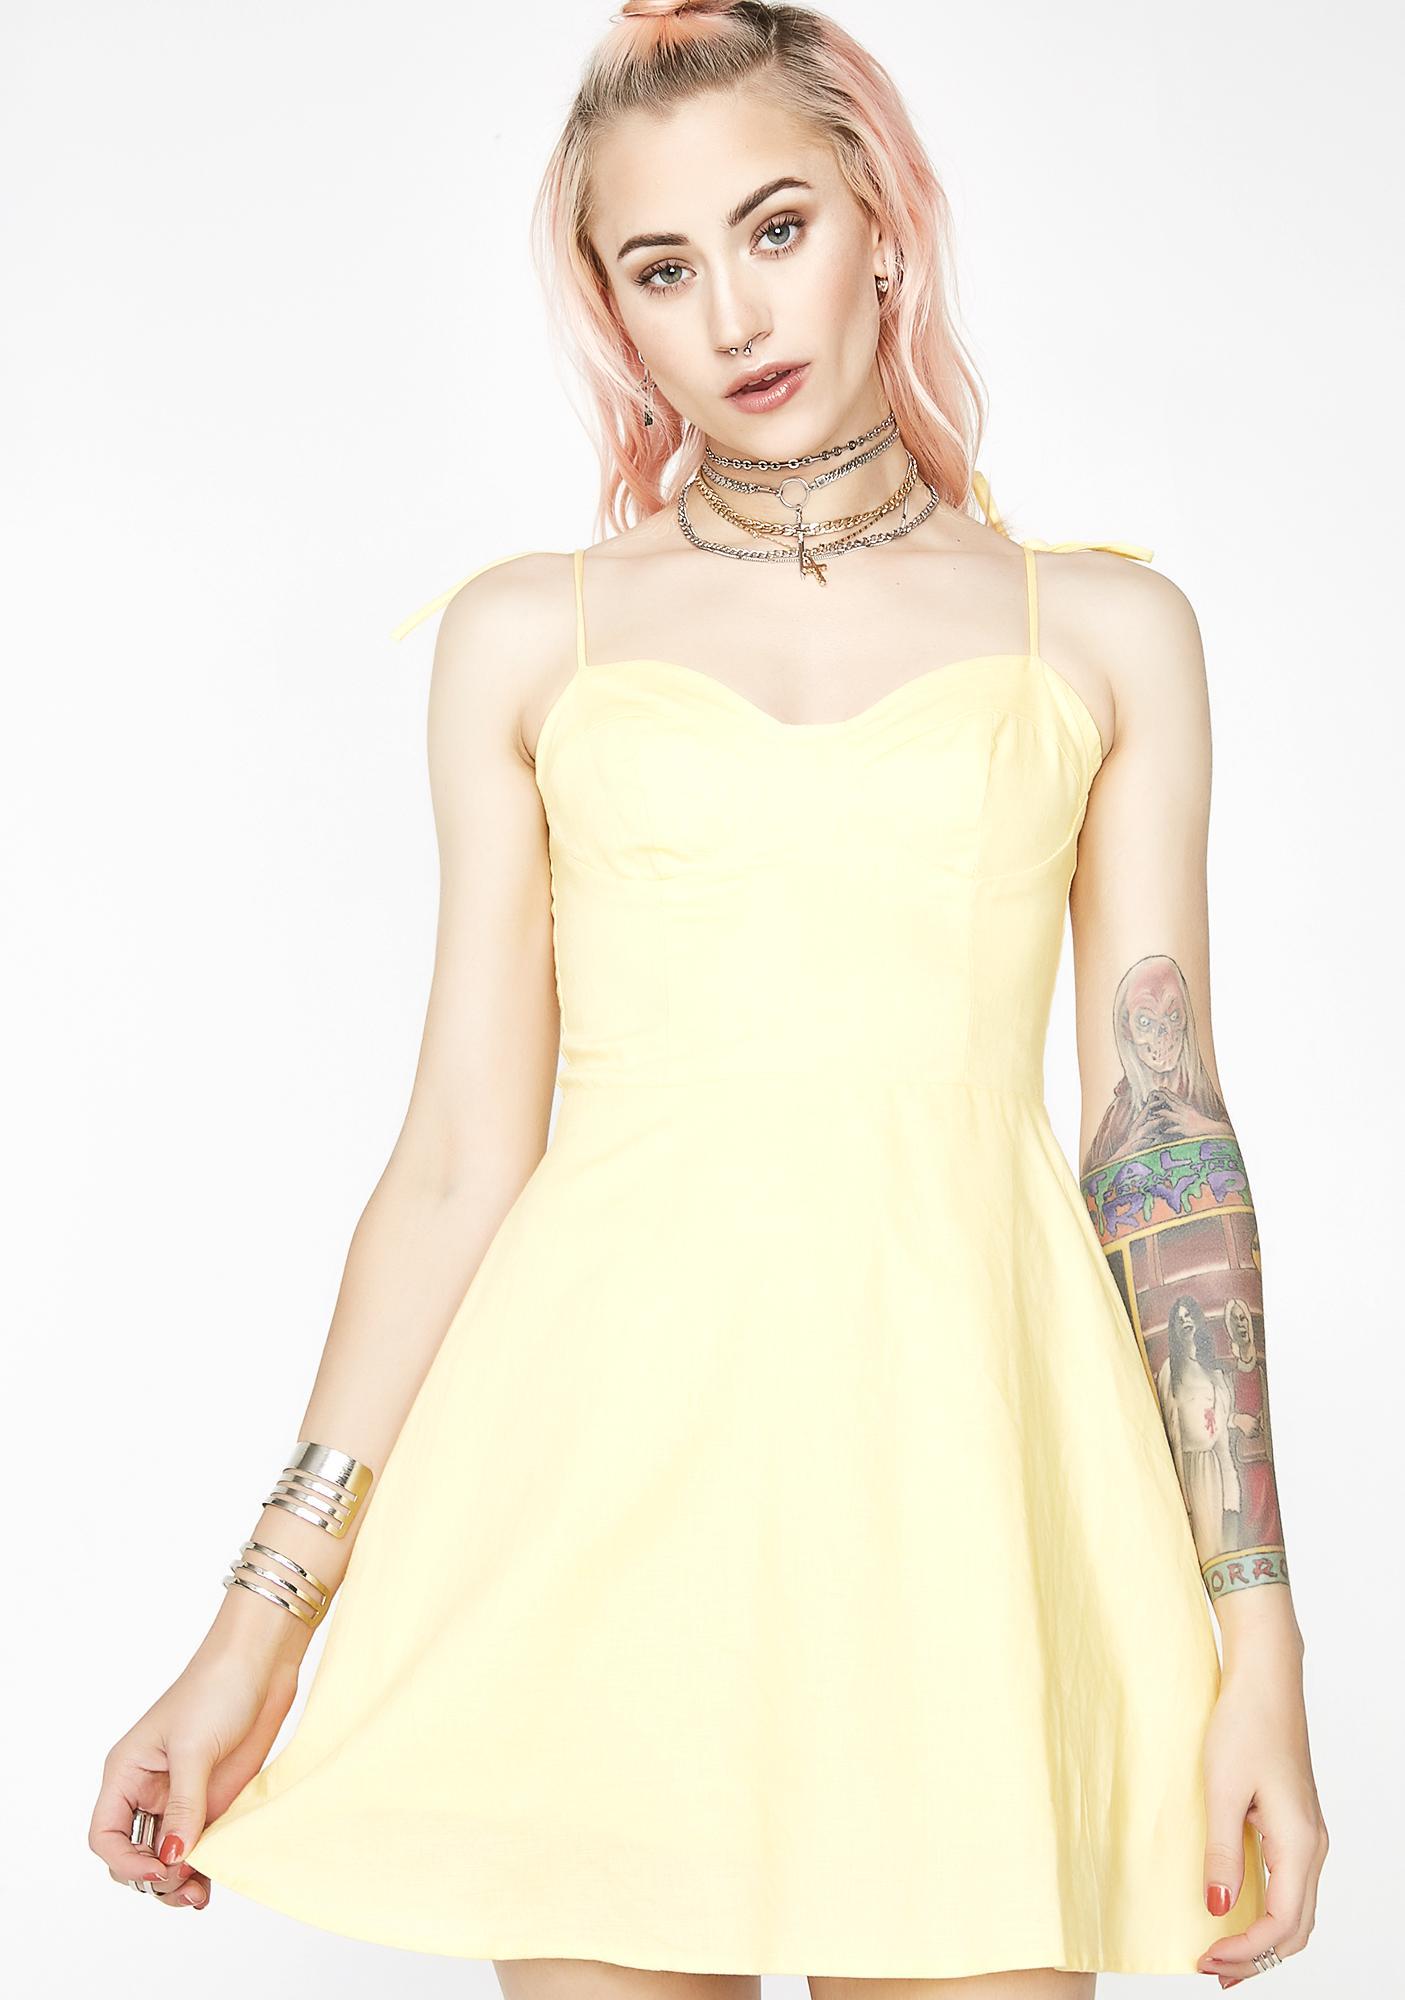 Mellow Daze Bustier Dress by Emory Park